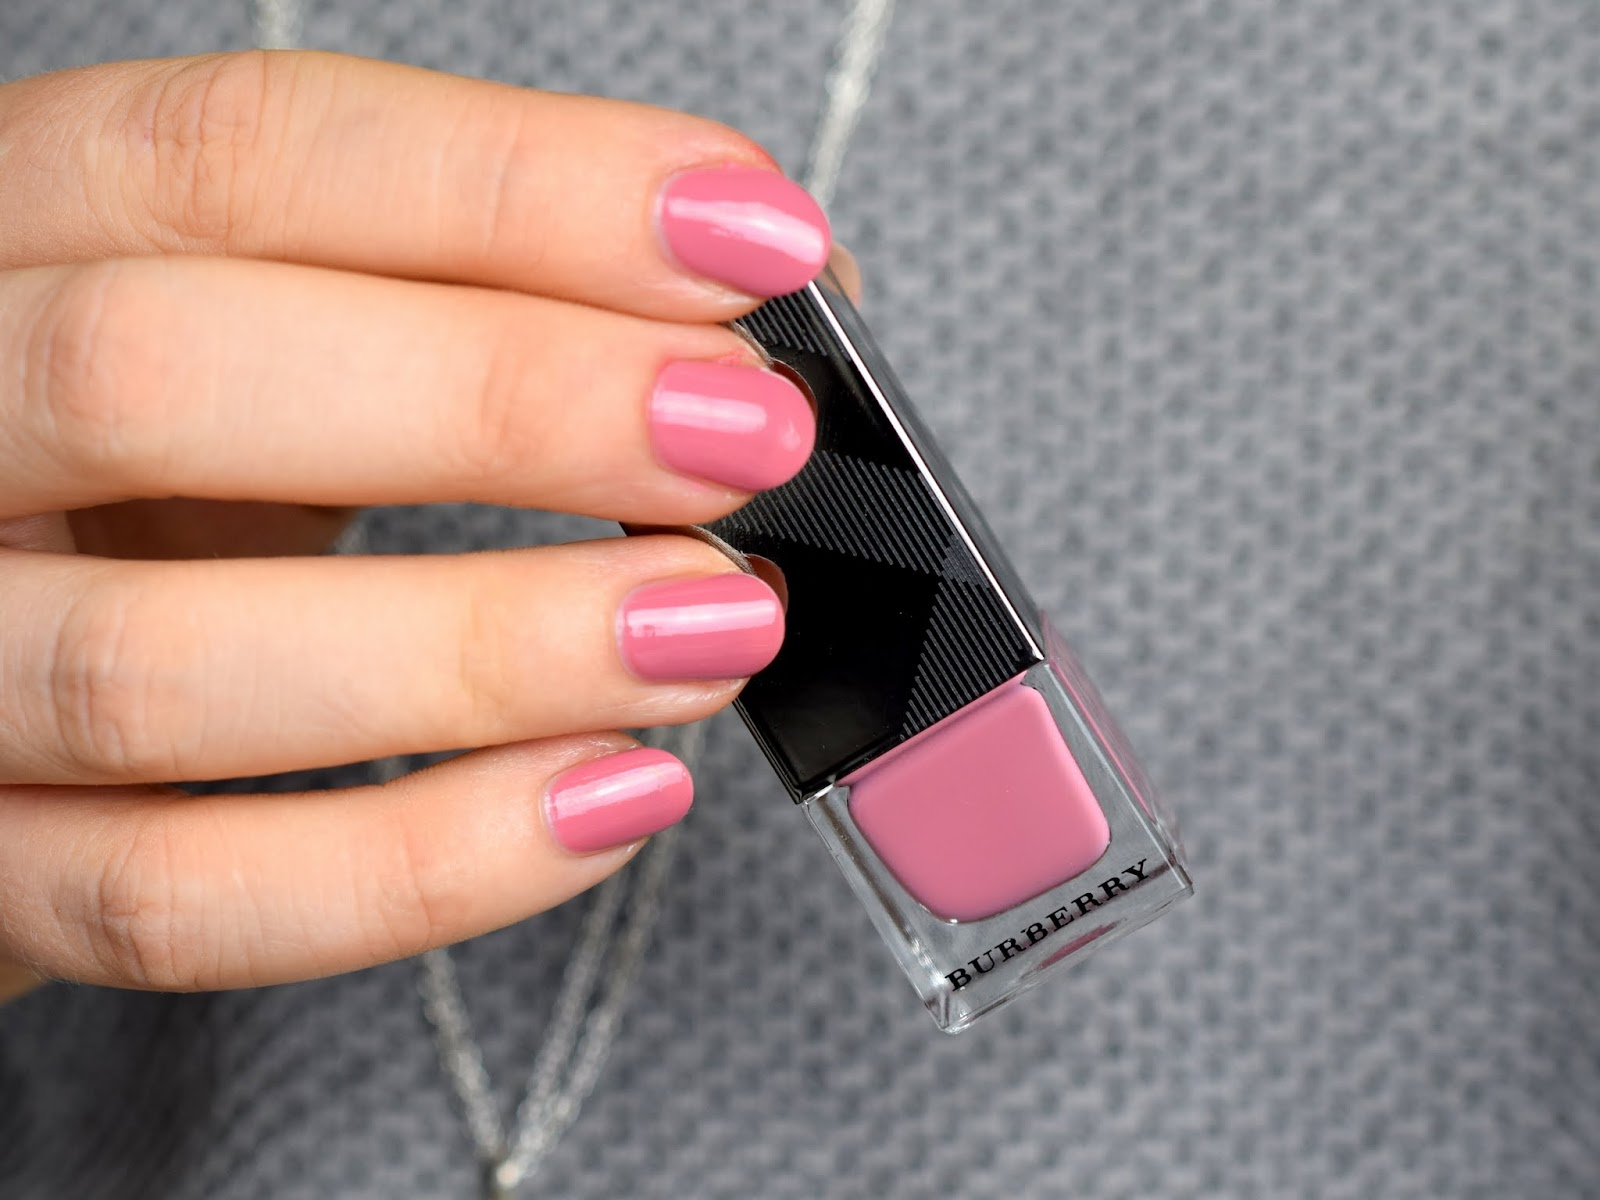 Burberry Spring / Summer 2015 - Nail Polish Hydrangea Pink